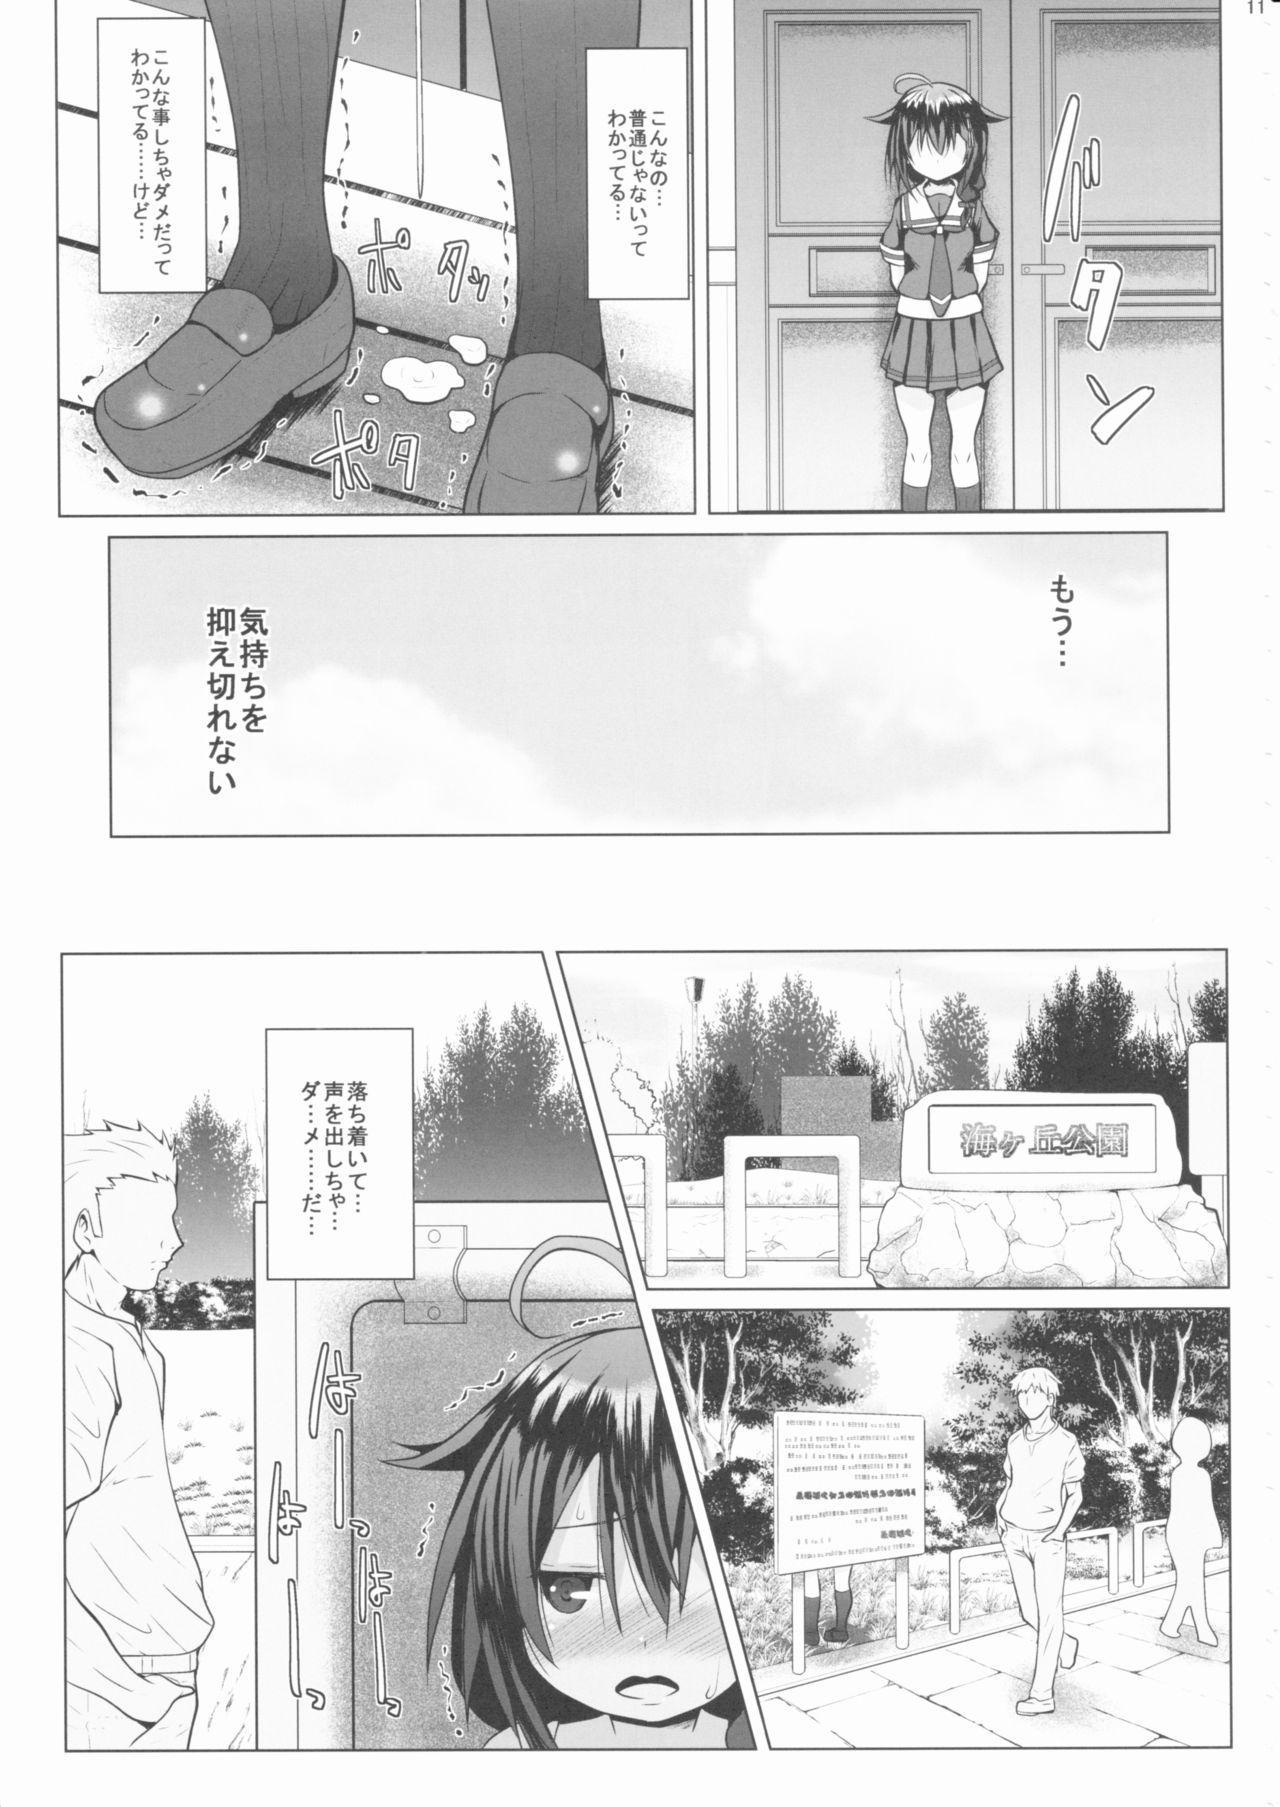 Yagai no Amaoto 9